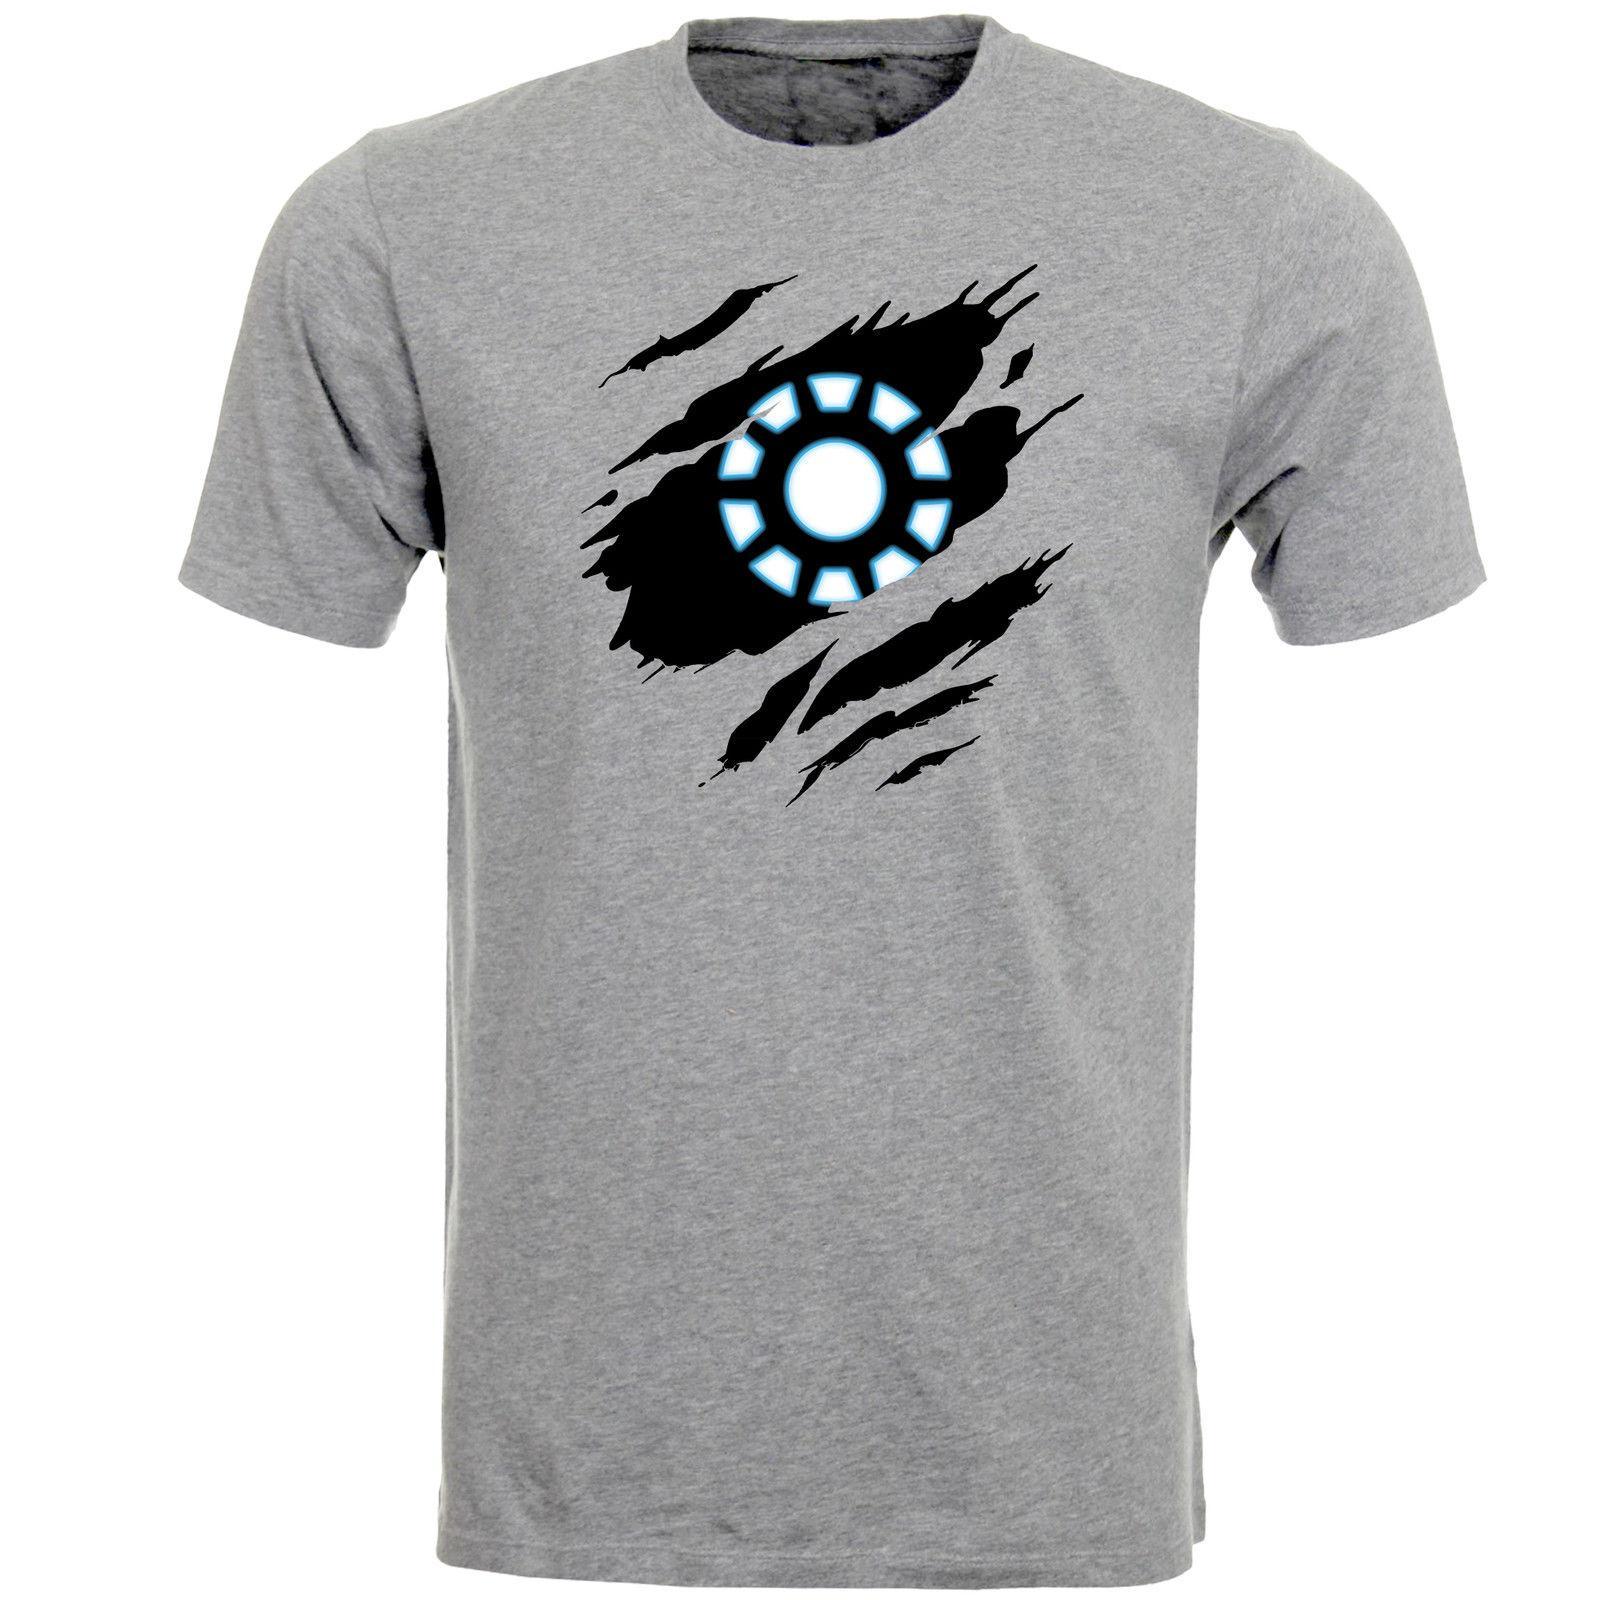 Compre Iron Man Arc Reactor Earth 616 Logo Marvel Comics Hero Camiseta Para  Hombre Camiseta Top AB65 A  11.48 Del Passion90  f419296a14dd0